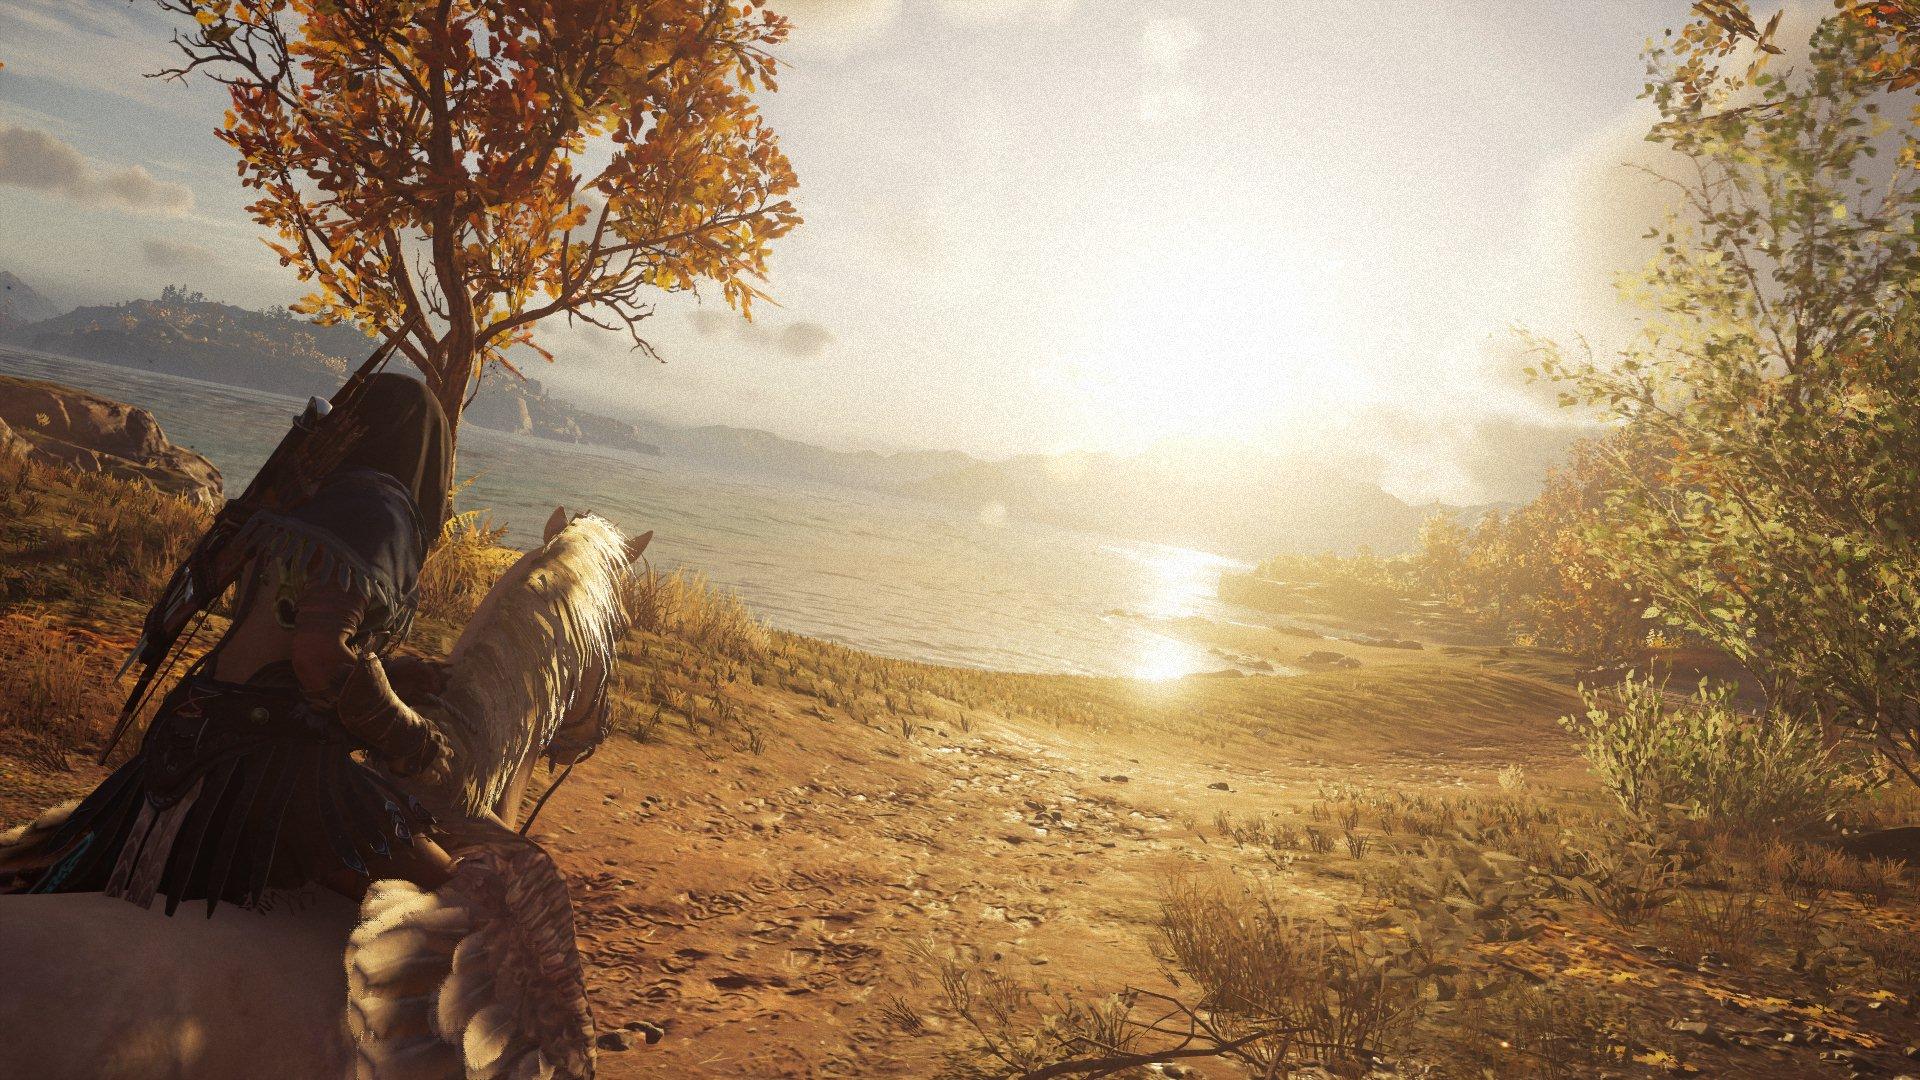 Assassin's Creed Odyssey Story Creator Mode | Ubisoft (US